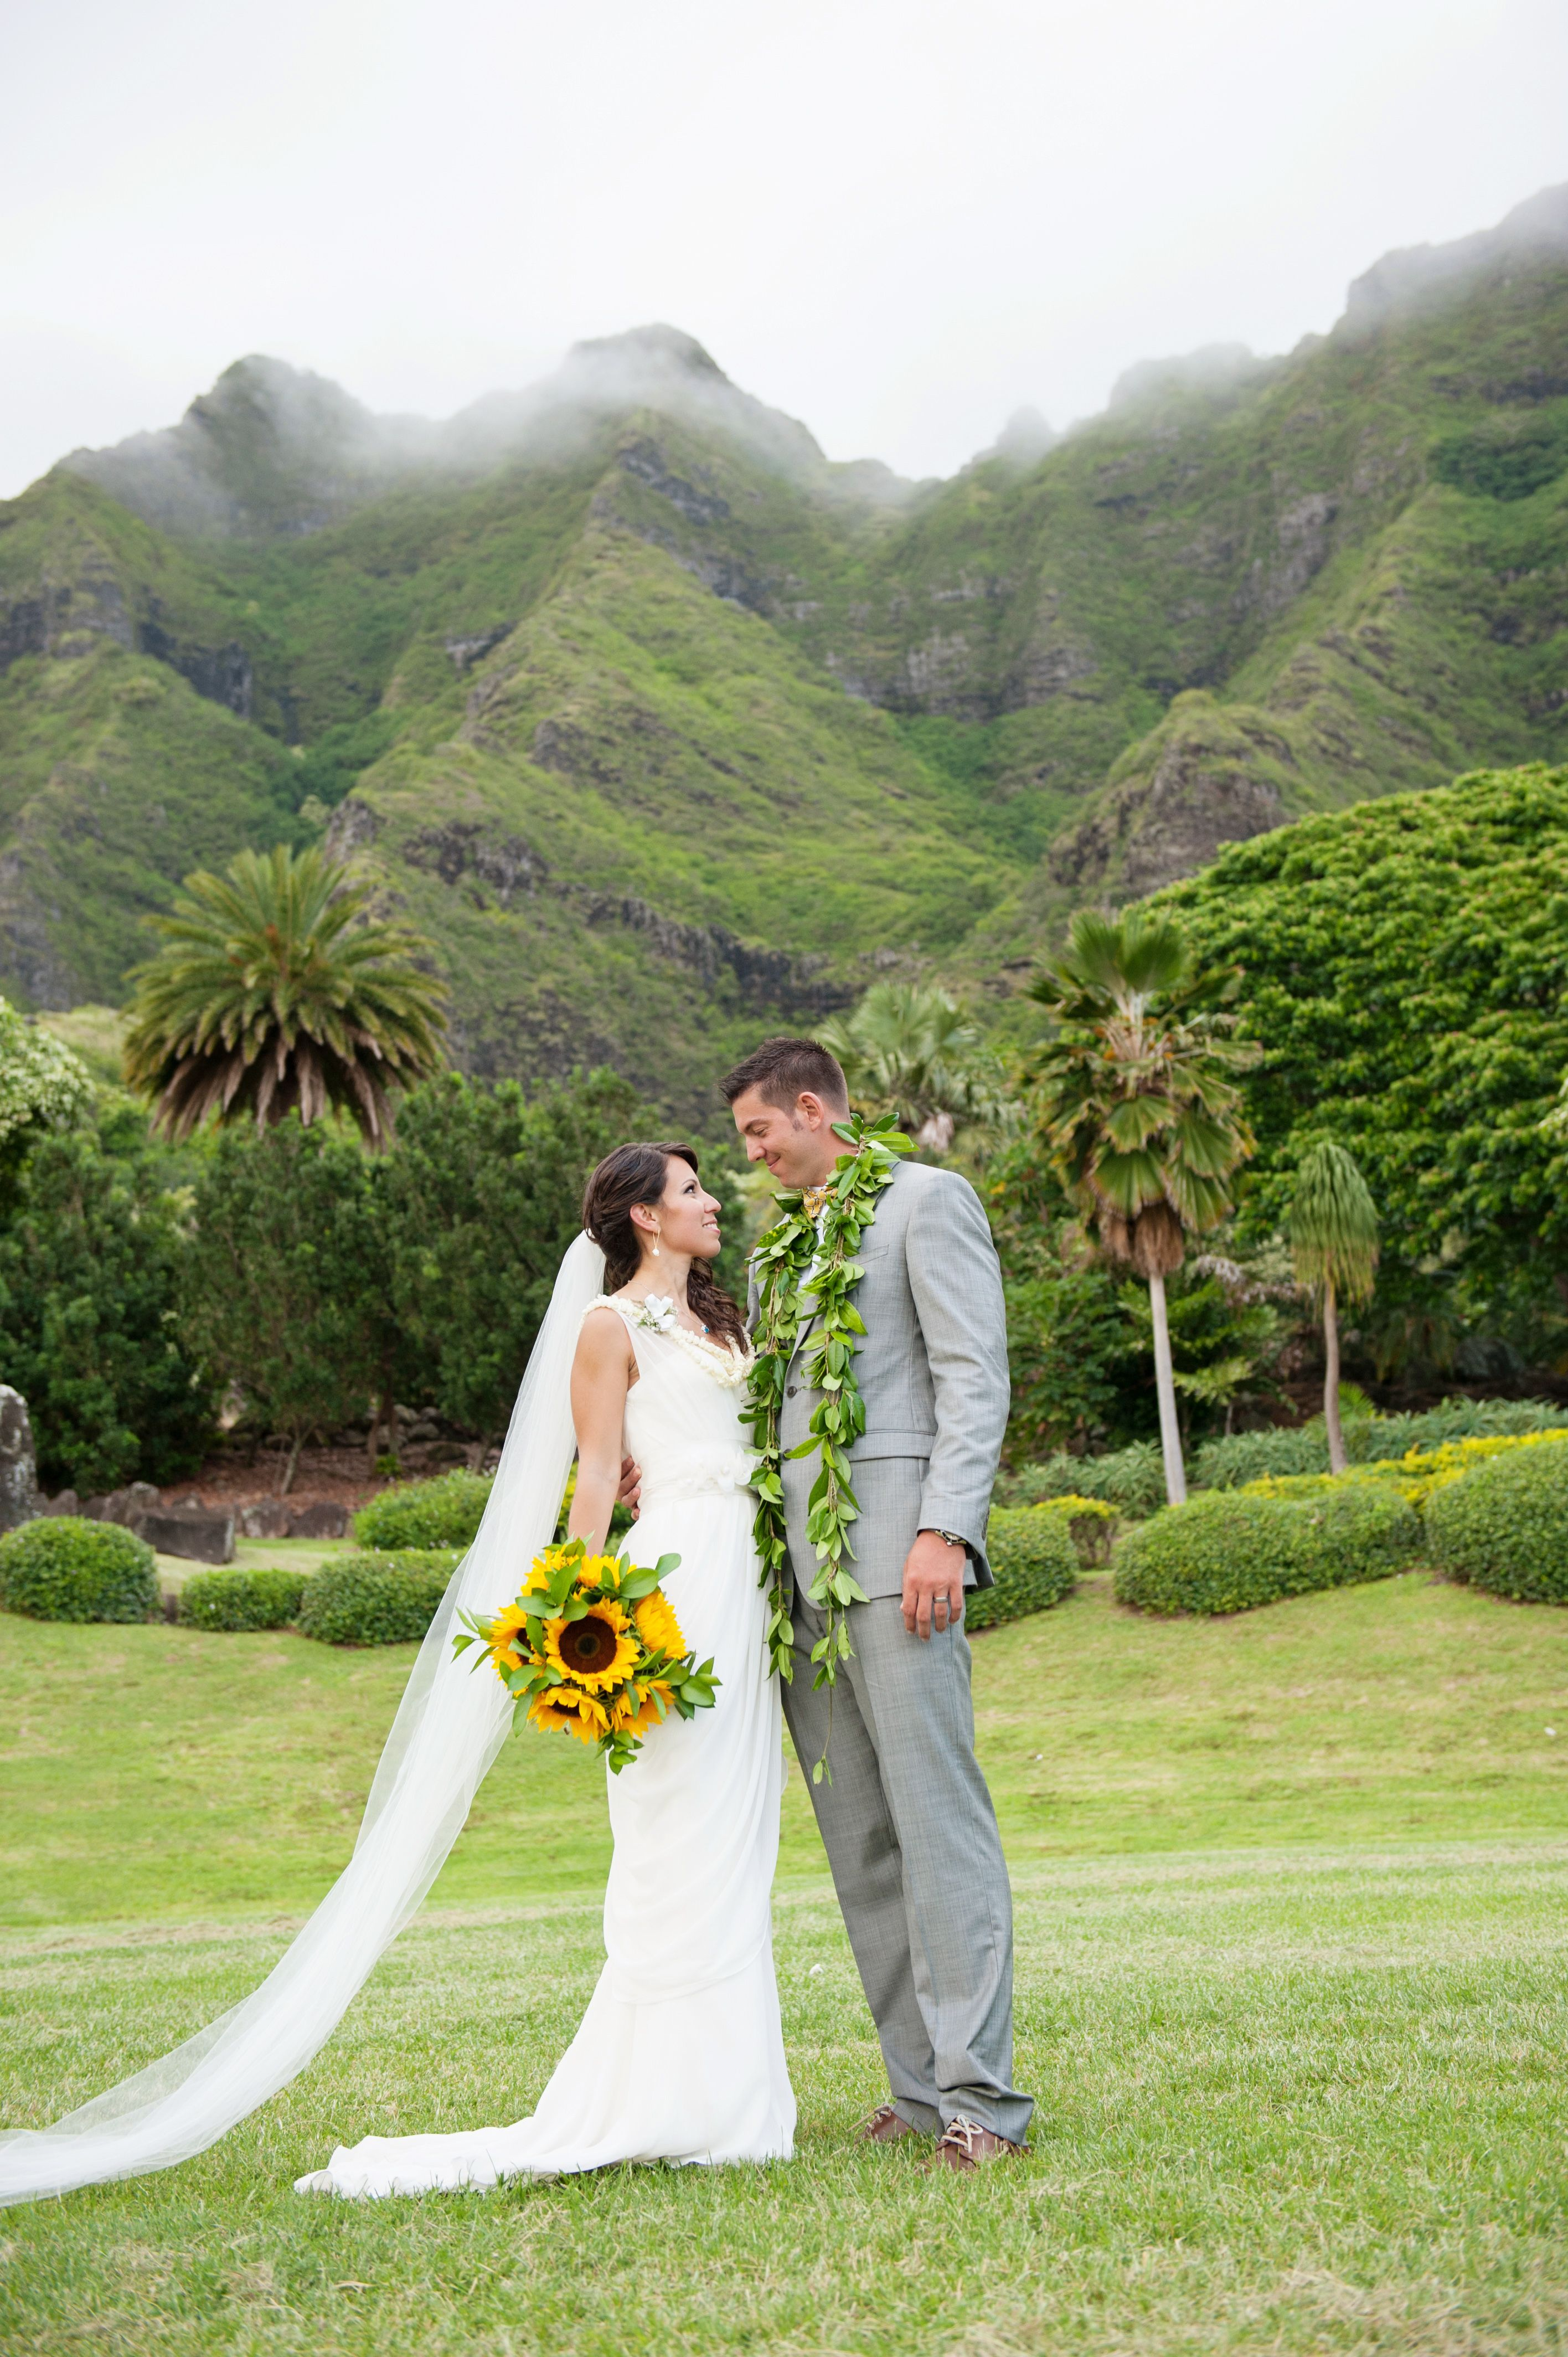 A colorful bold wedding at kualoa ranch in kaneohe hawaii